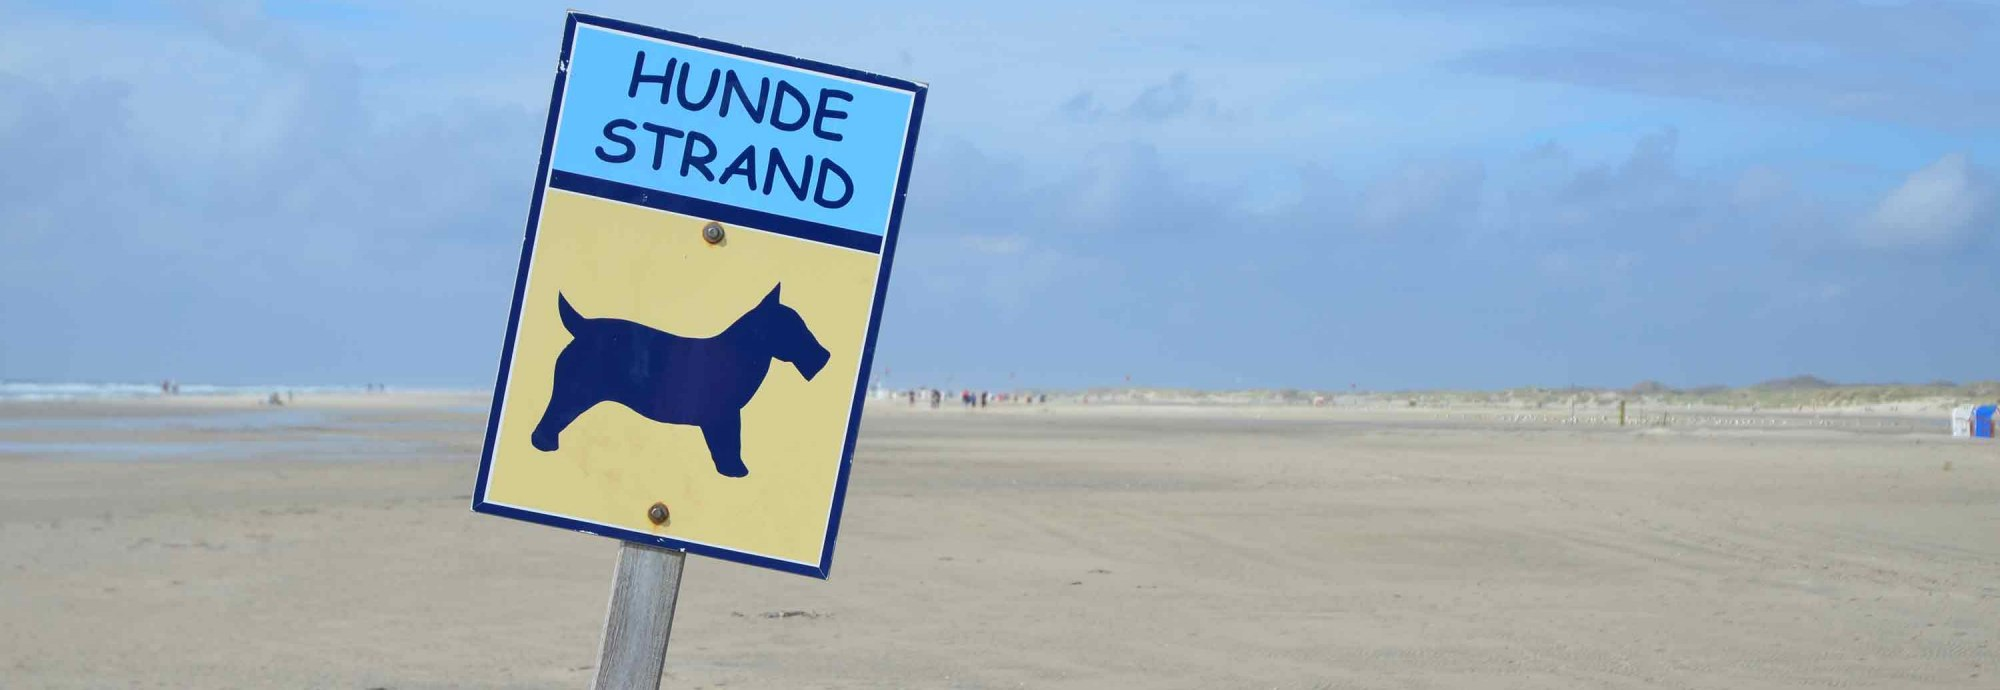 Hundestrand Amrum, © KQuedens